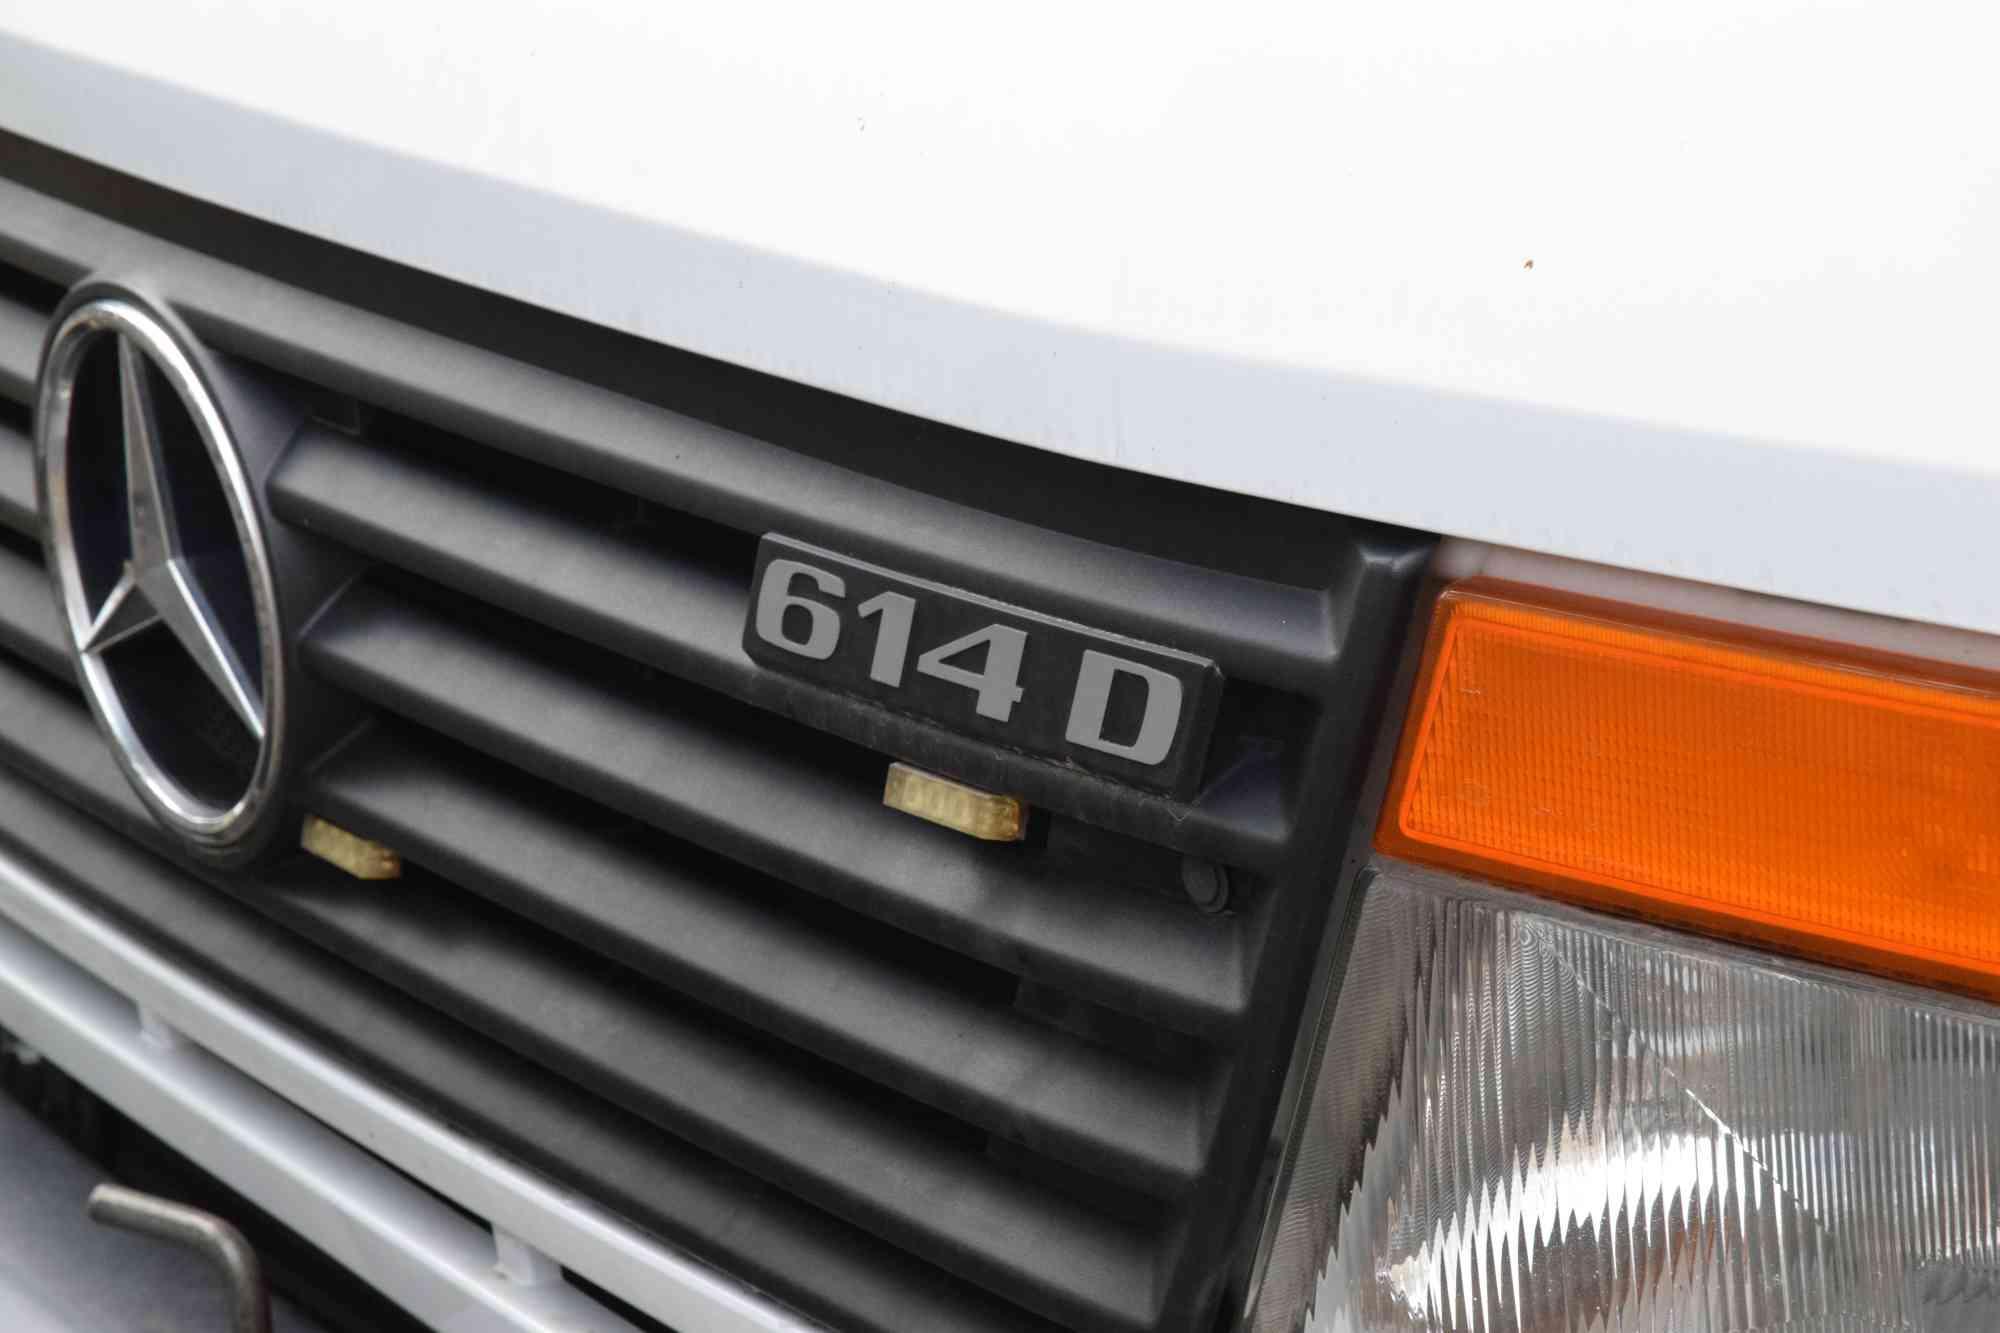 Wooike Merc 617D-9